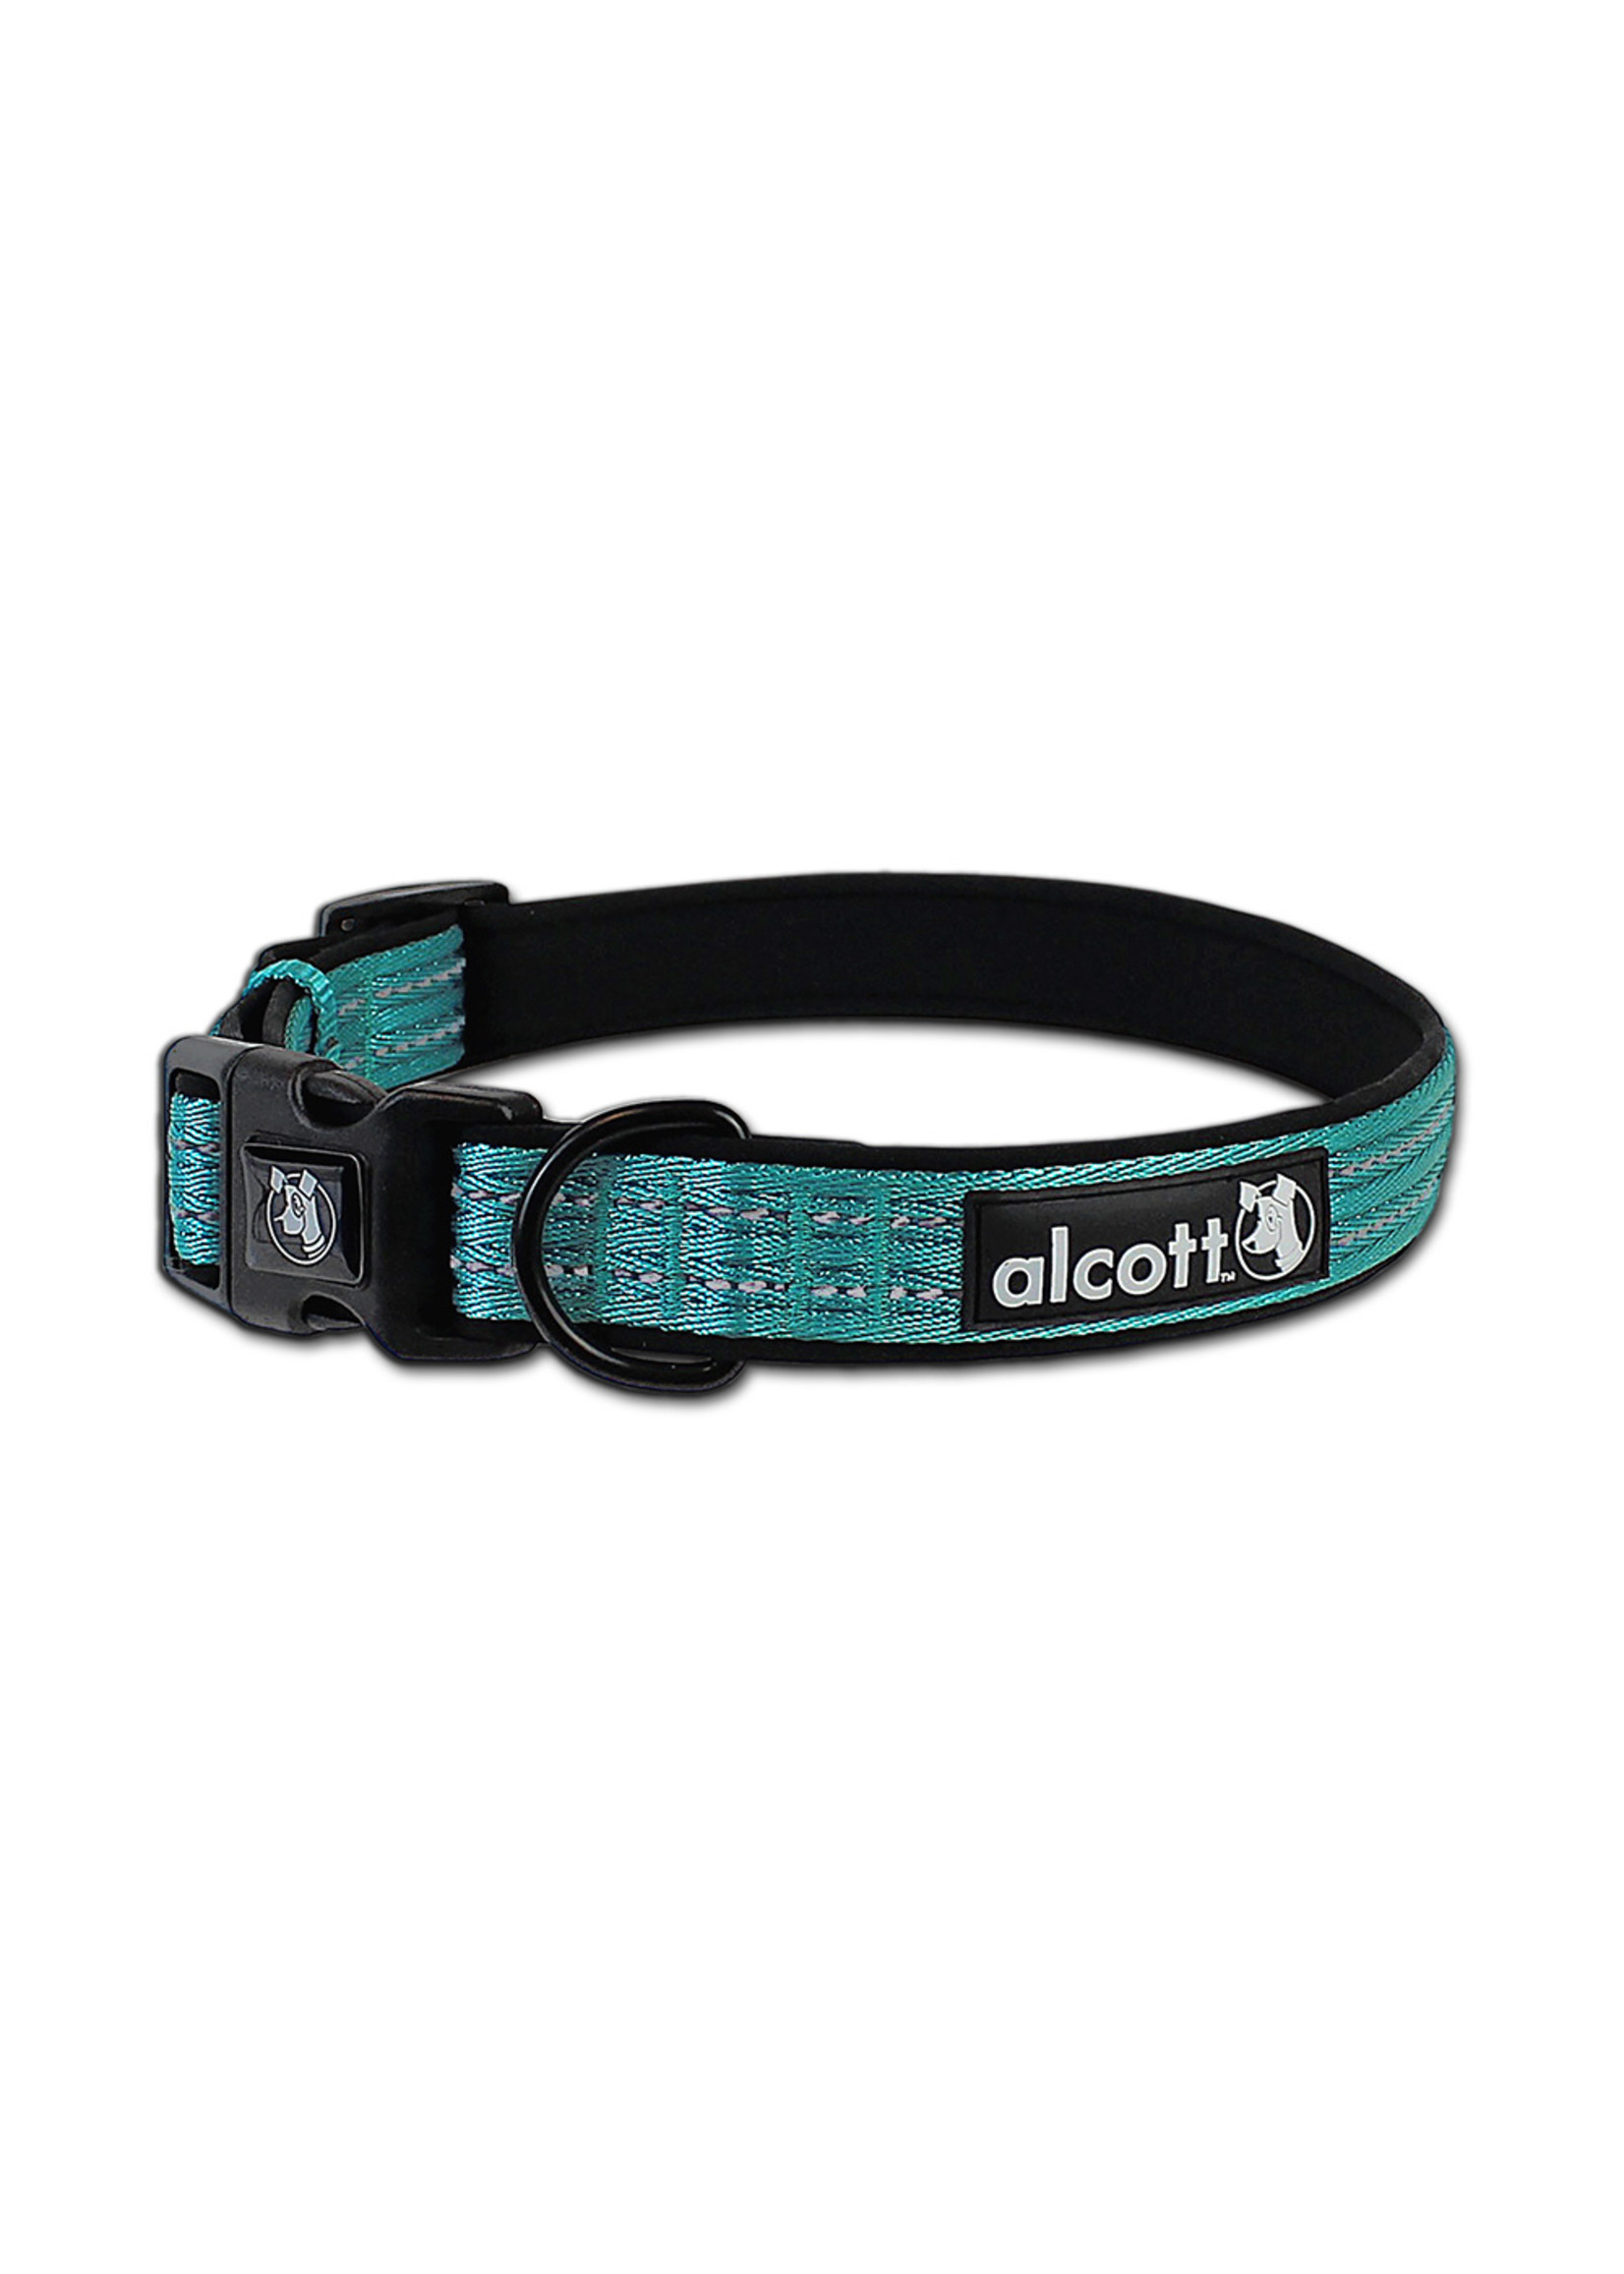 Alcott Adventures Collar